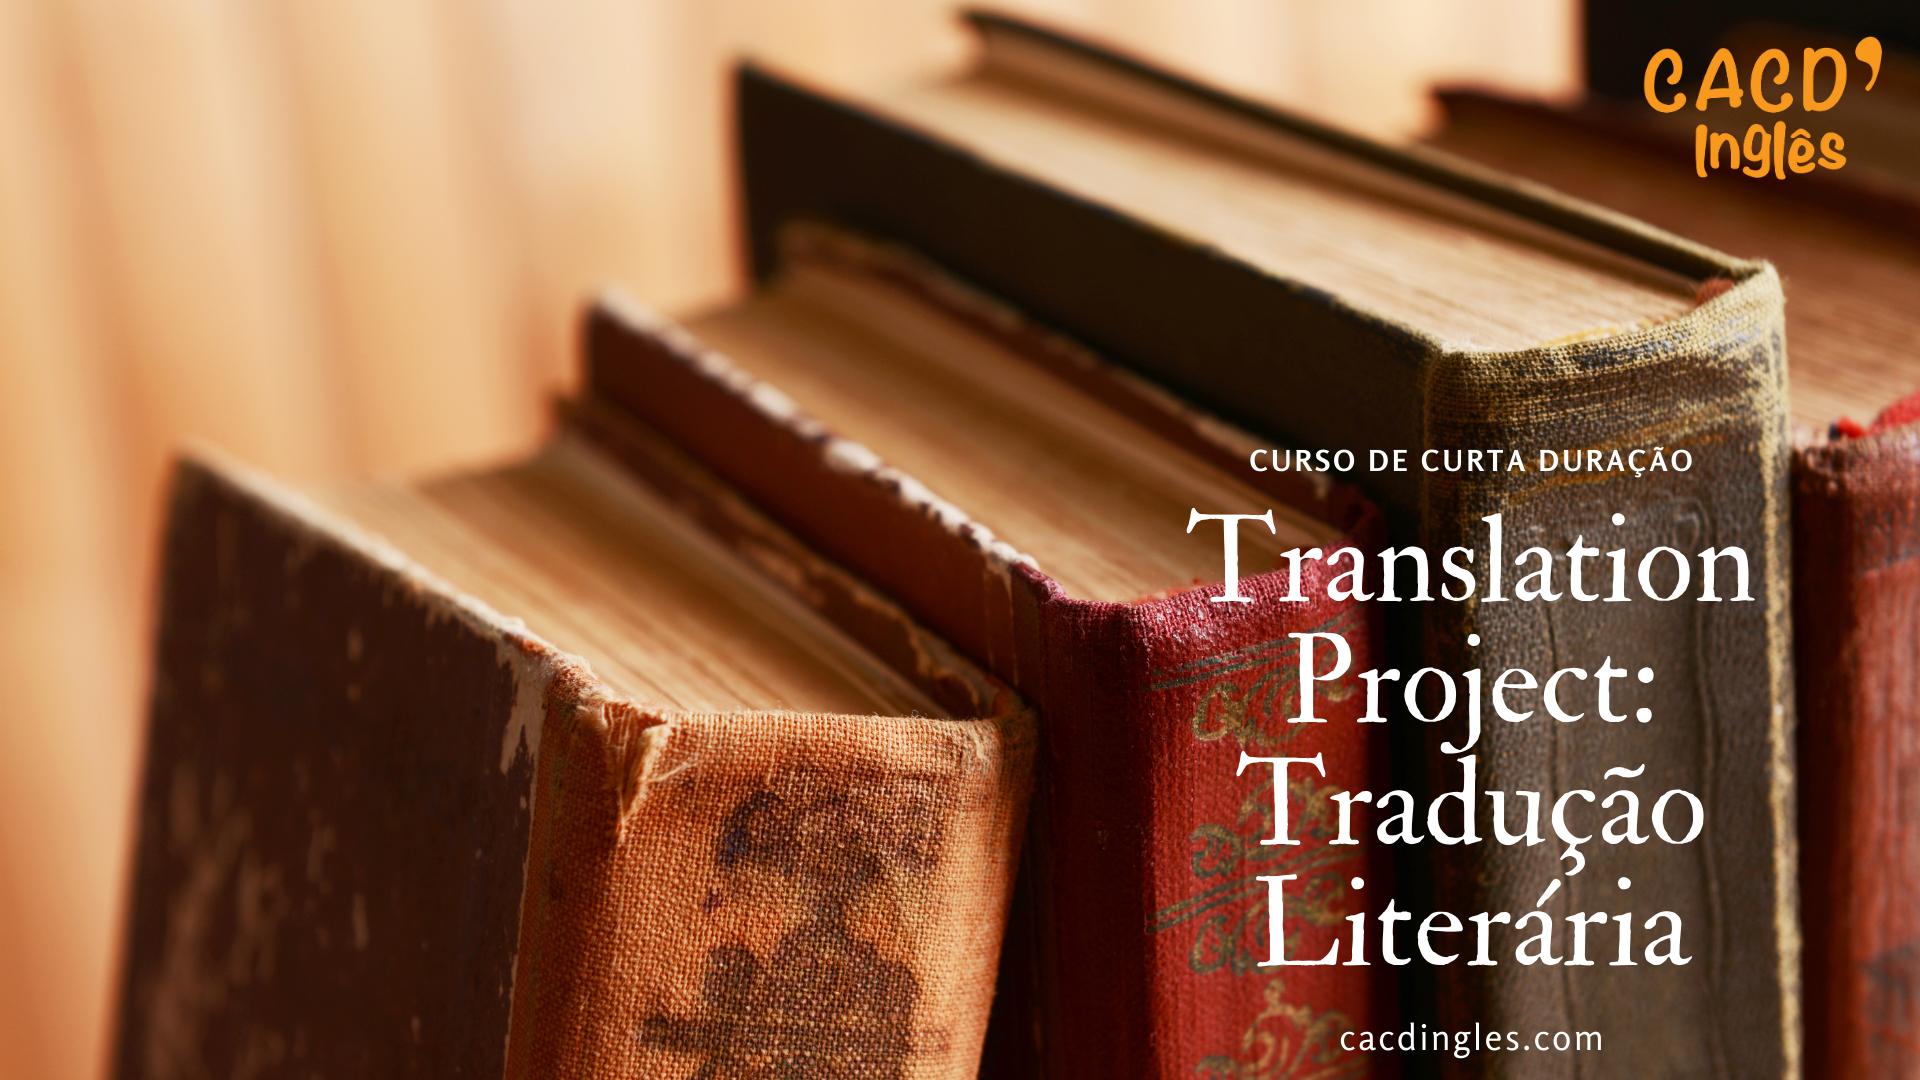 Translation Project: Tradução Literária